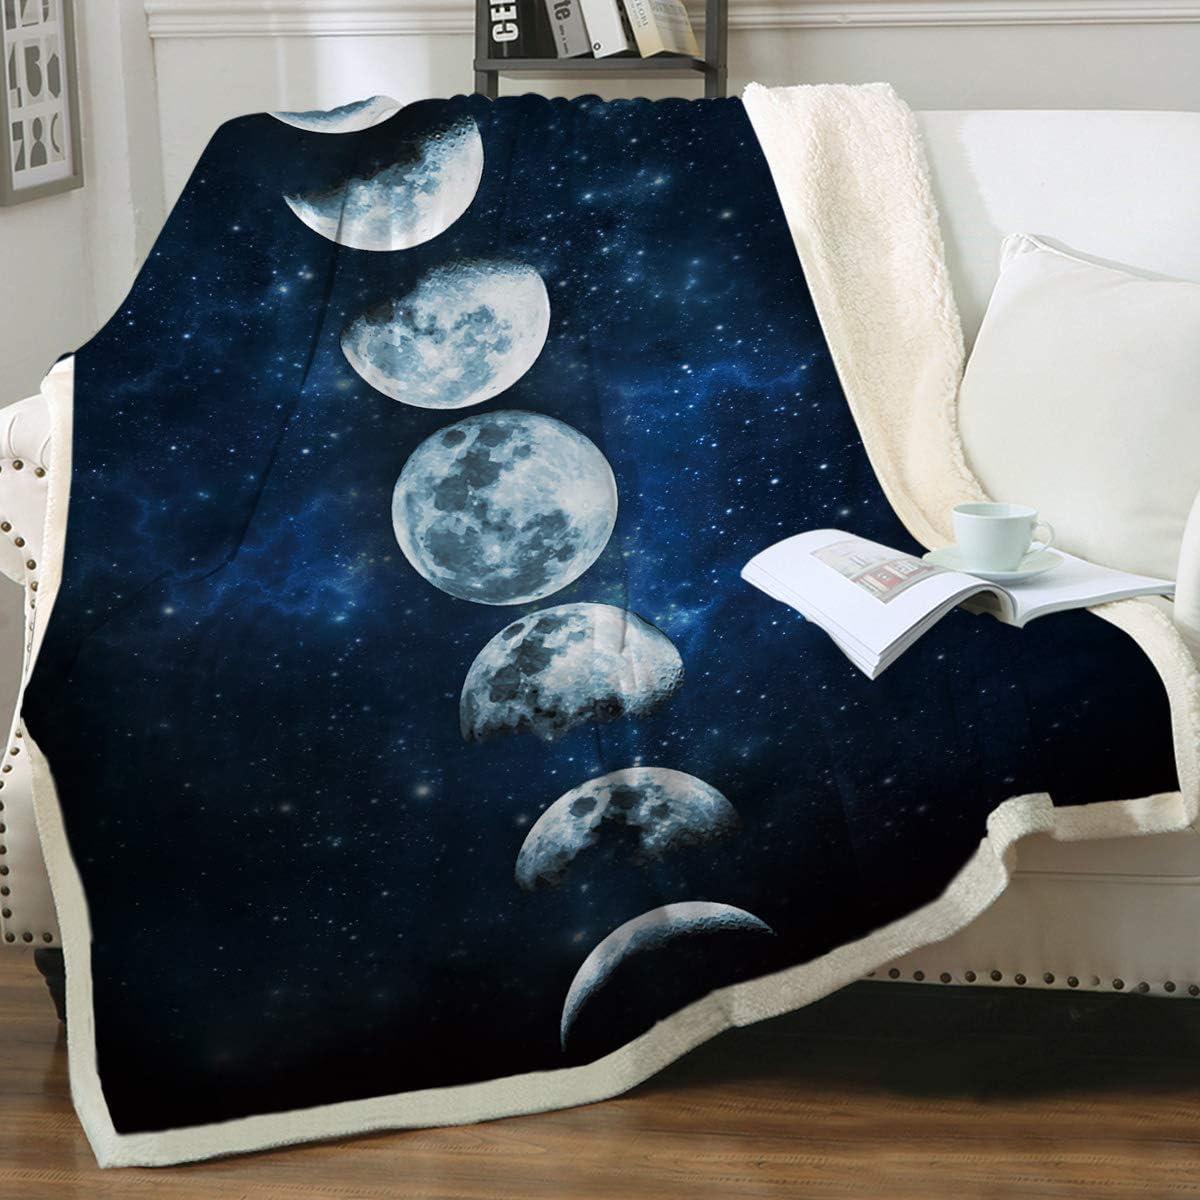 Sleepwish Lunar Eclipse Blanket Moon Phases Blanket Celestial Fleece Blanket Dark Blue Sherpa Throw Blanket College Dorm Blanket (60